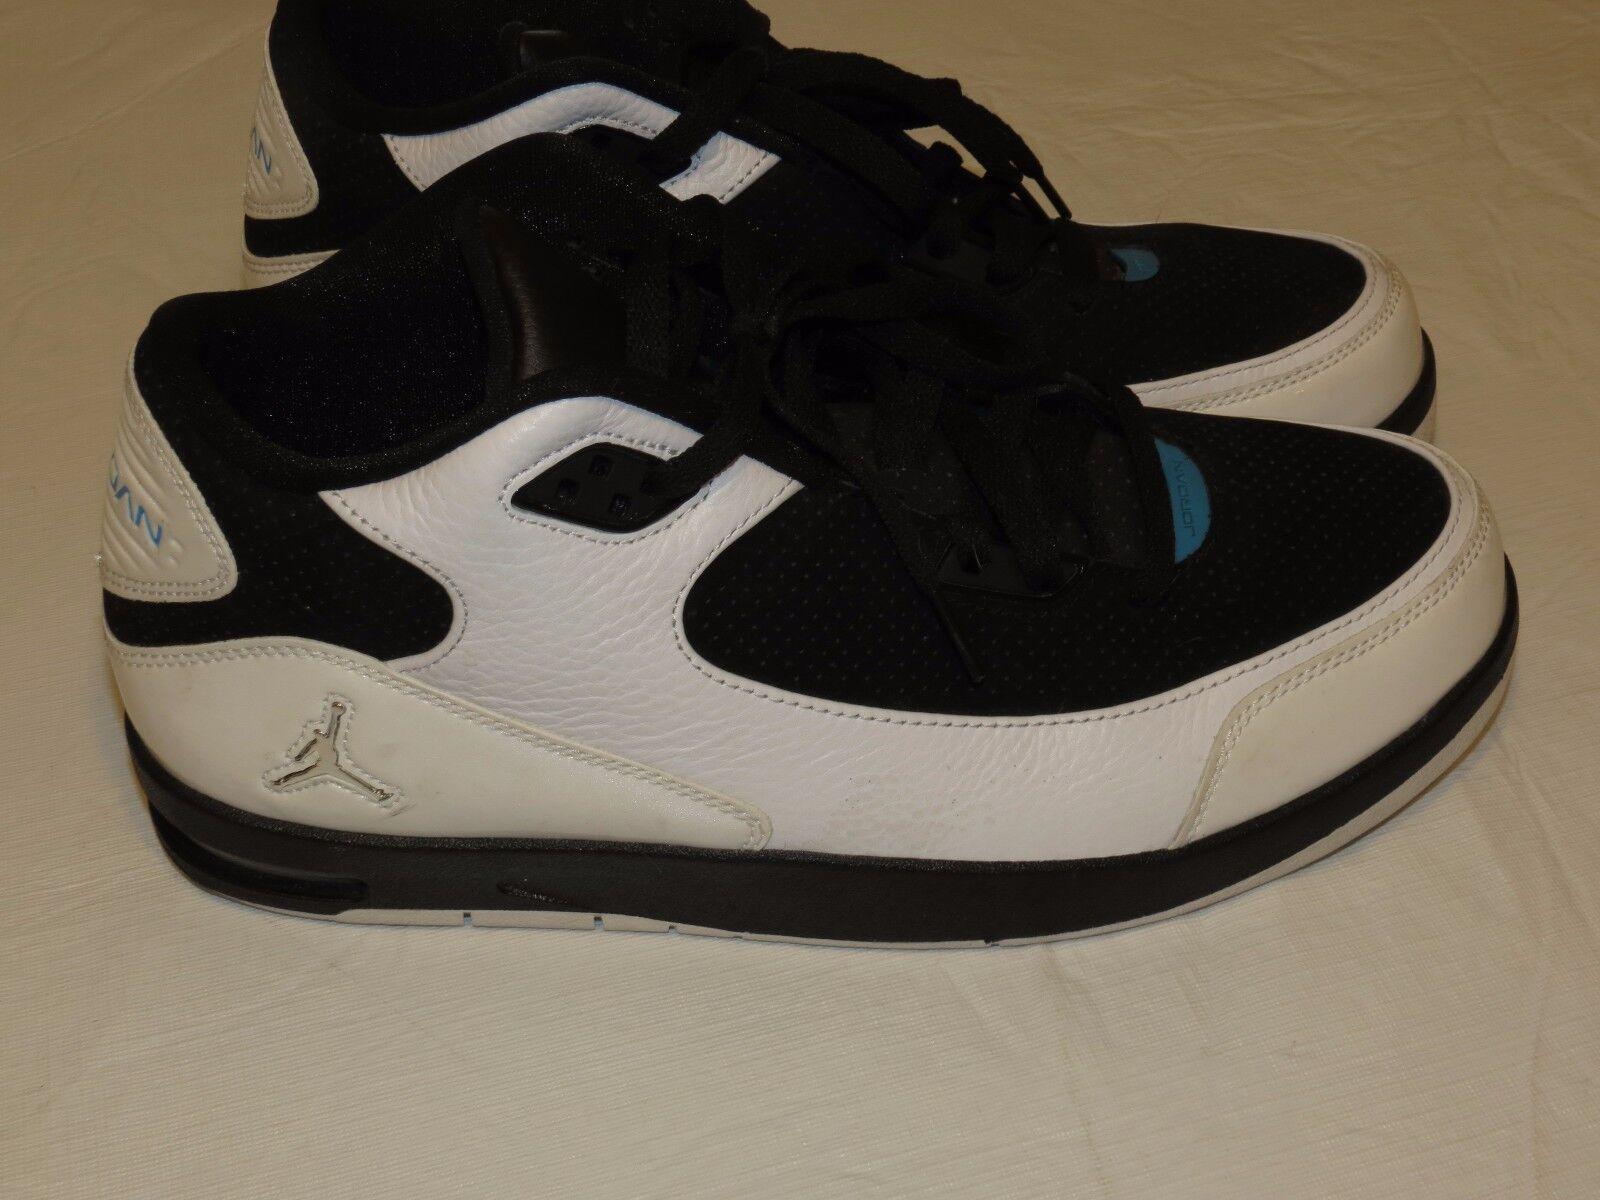 Le scarpe nike air jordan uomini ci rare ln3 basket bianco nero 428825-105 11